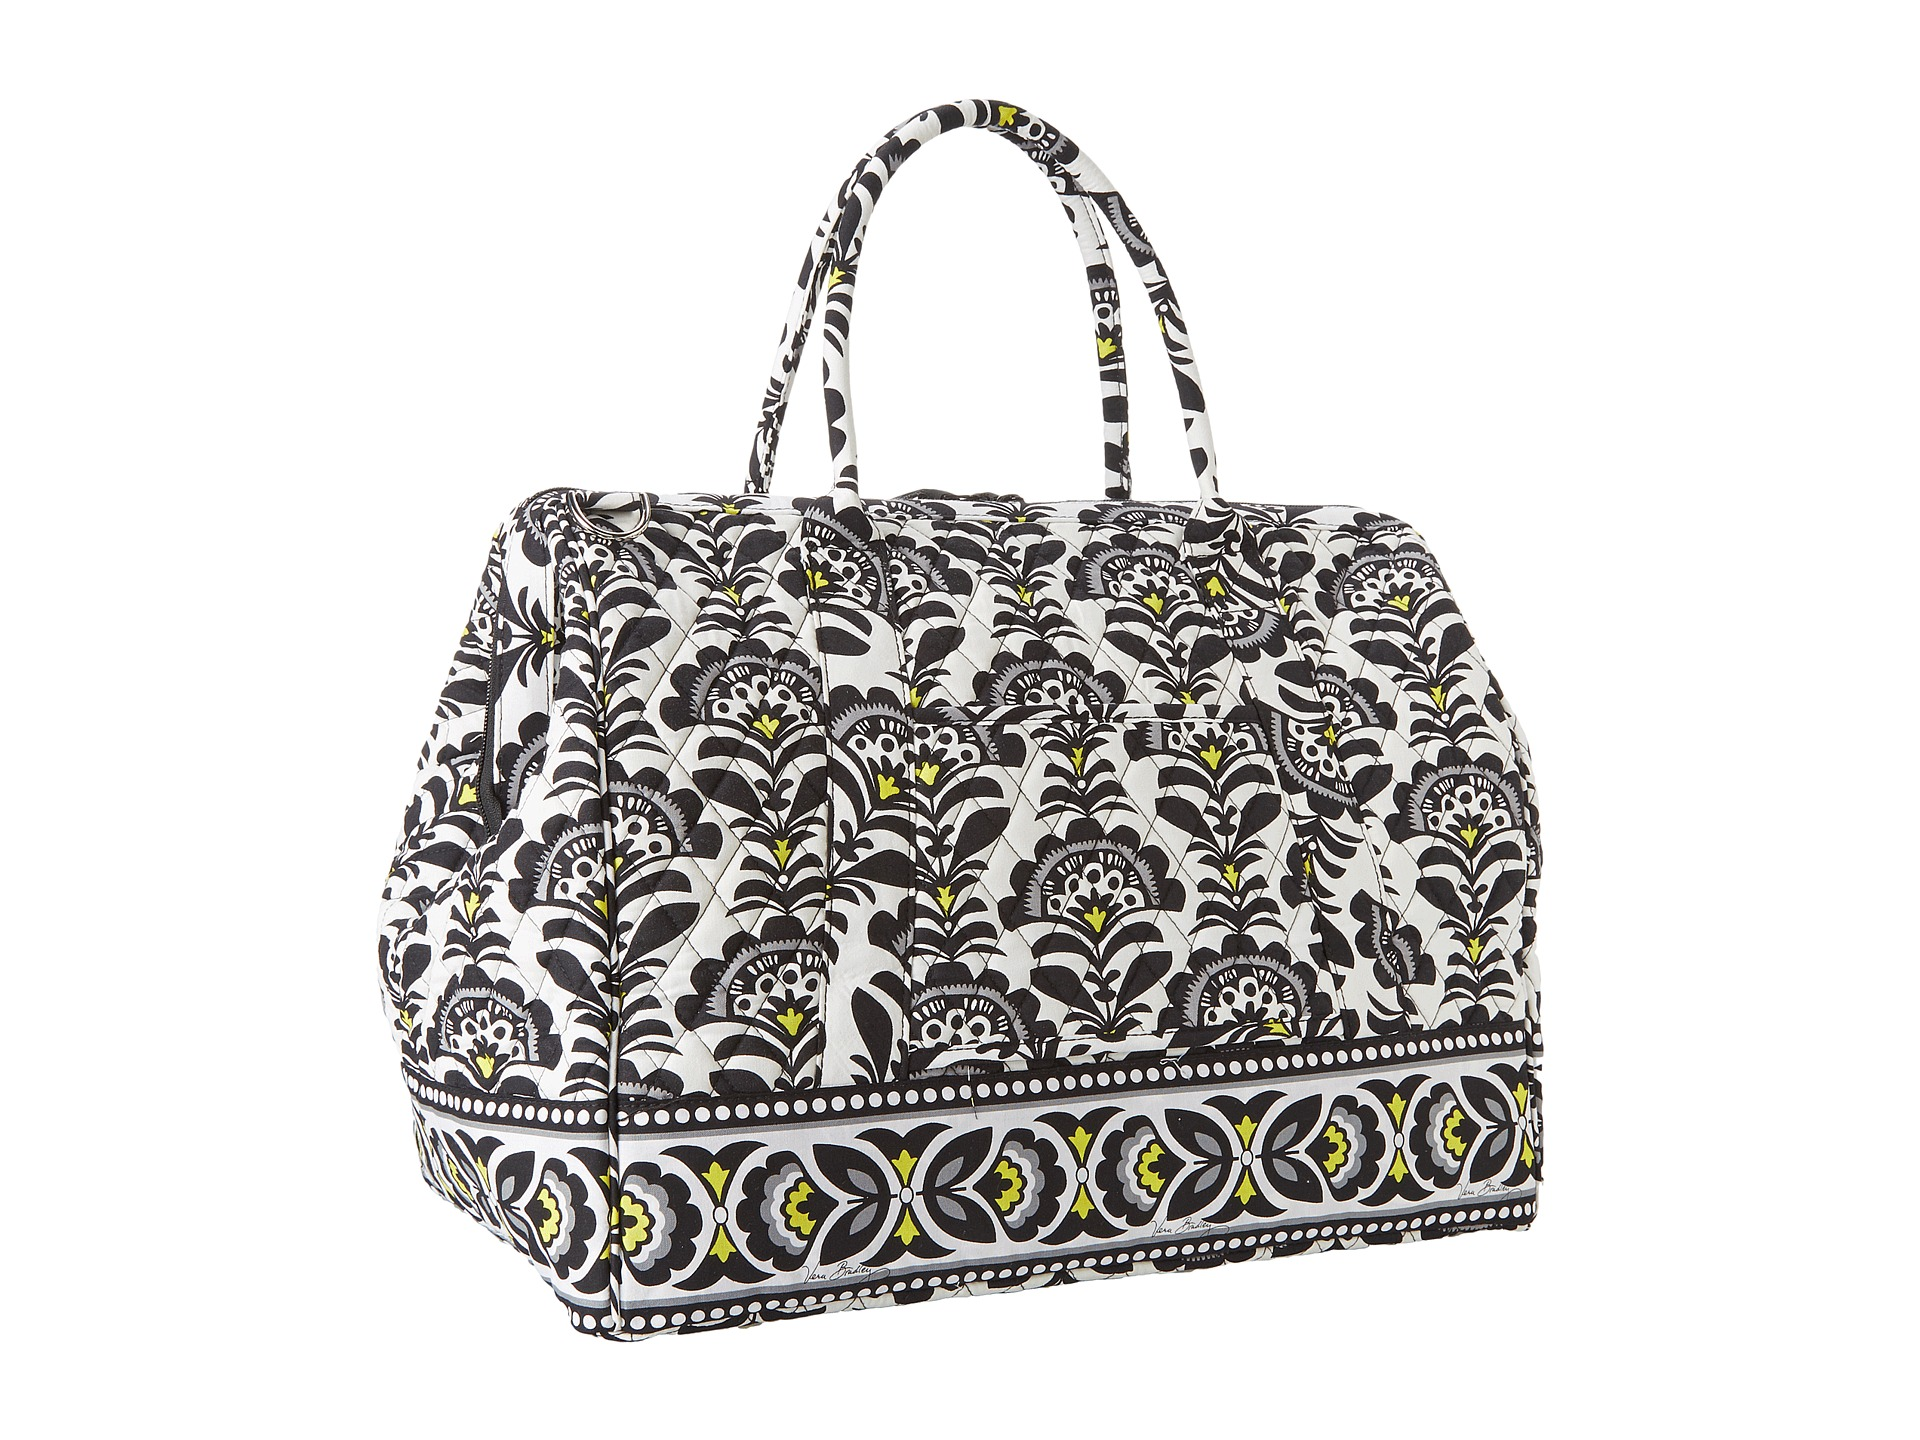 Vera Bradley Frame Travel Bag.Small Handbags: Vera Bradley Frame Bag ...